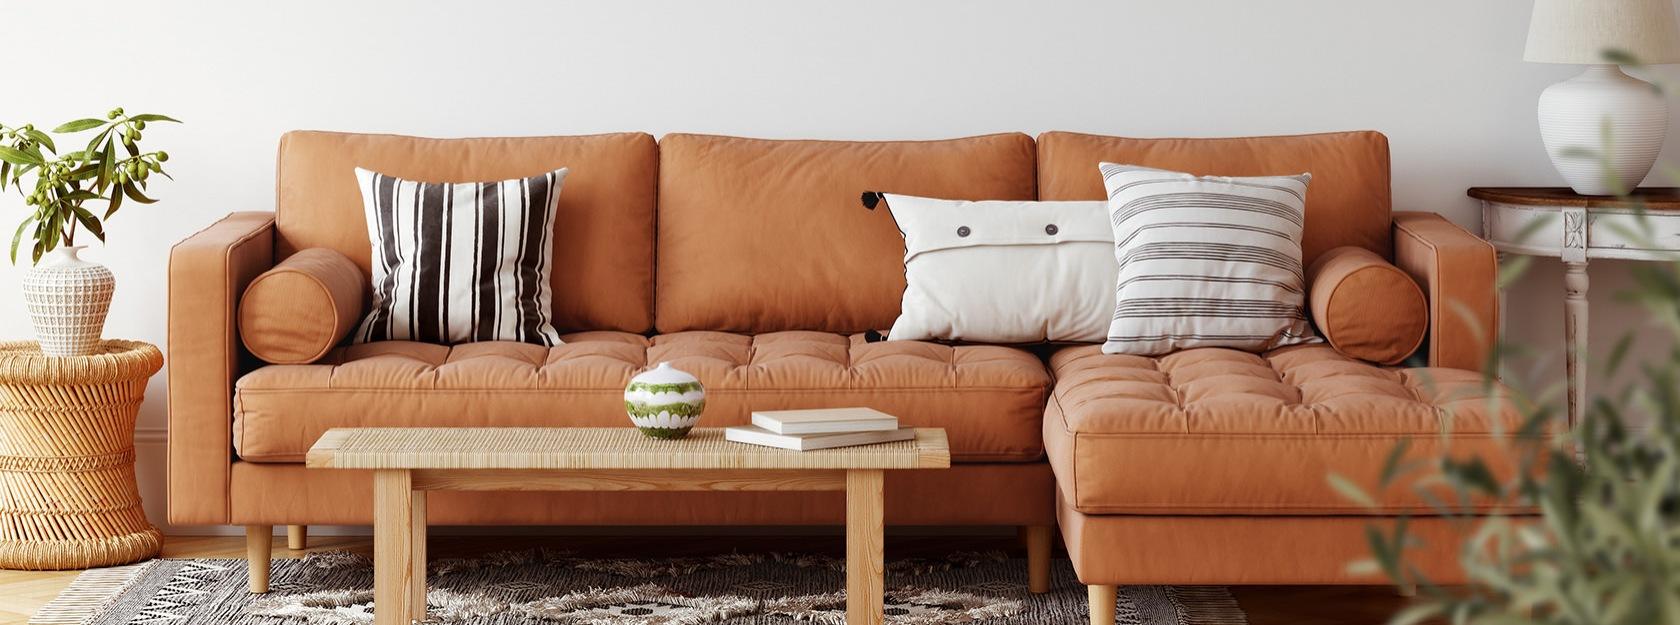 well lit, furnished living room